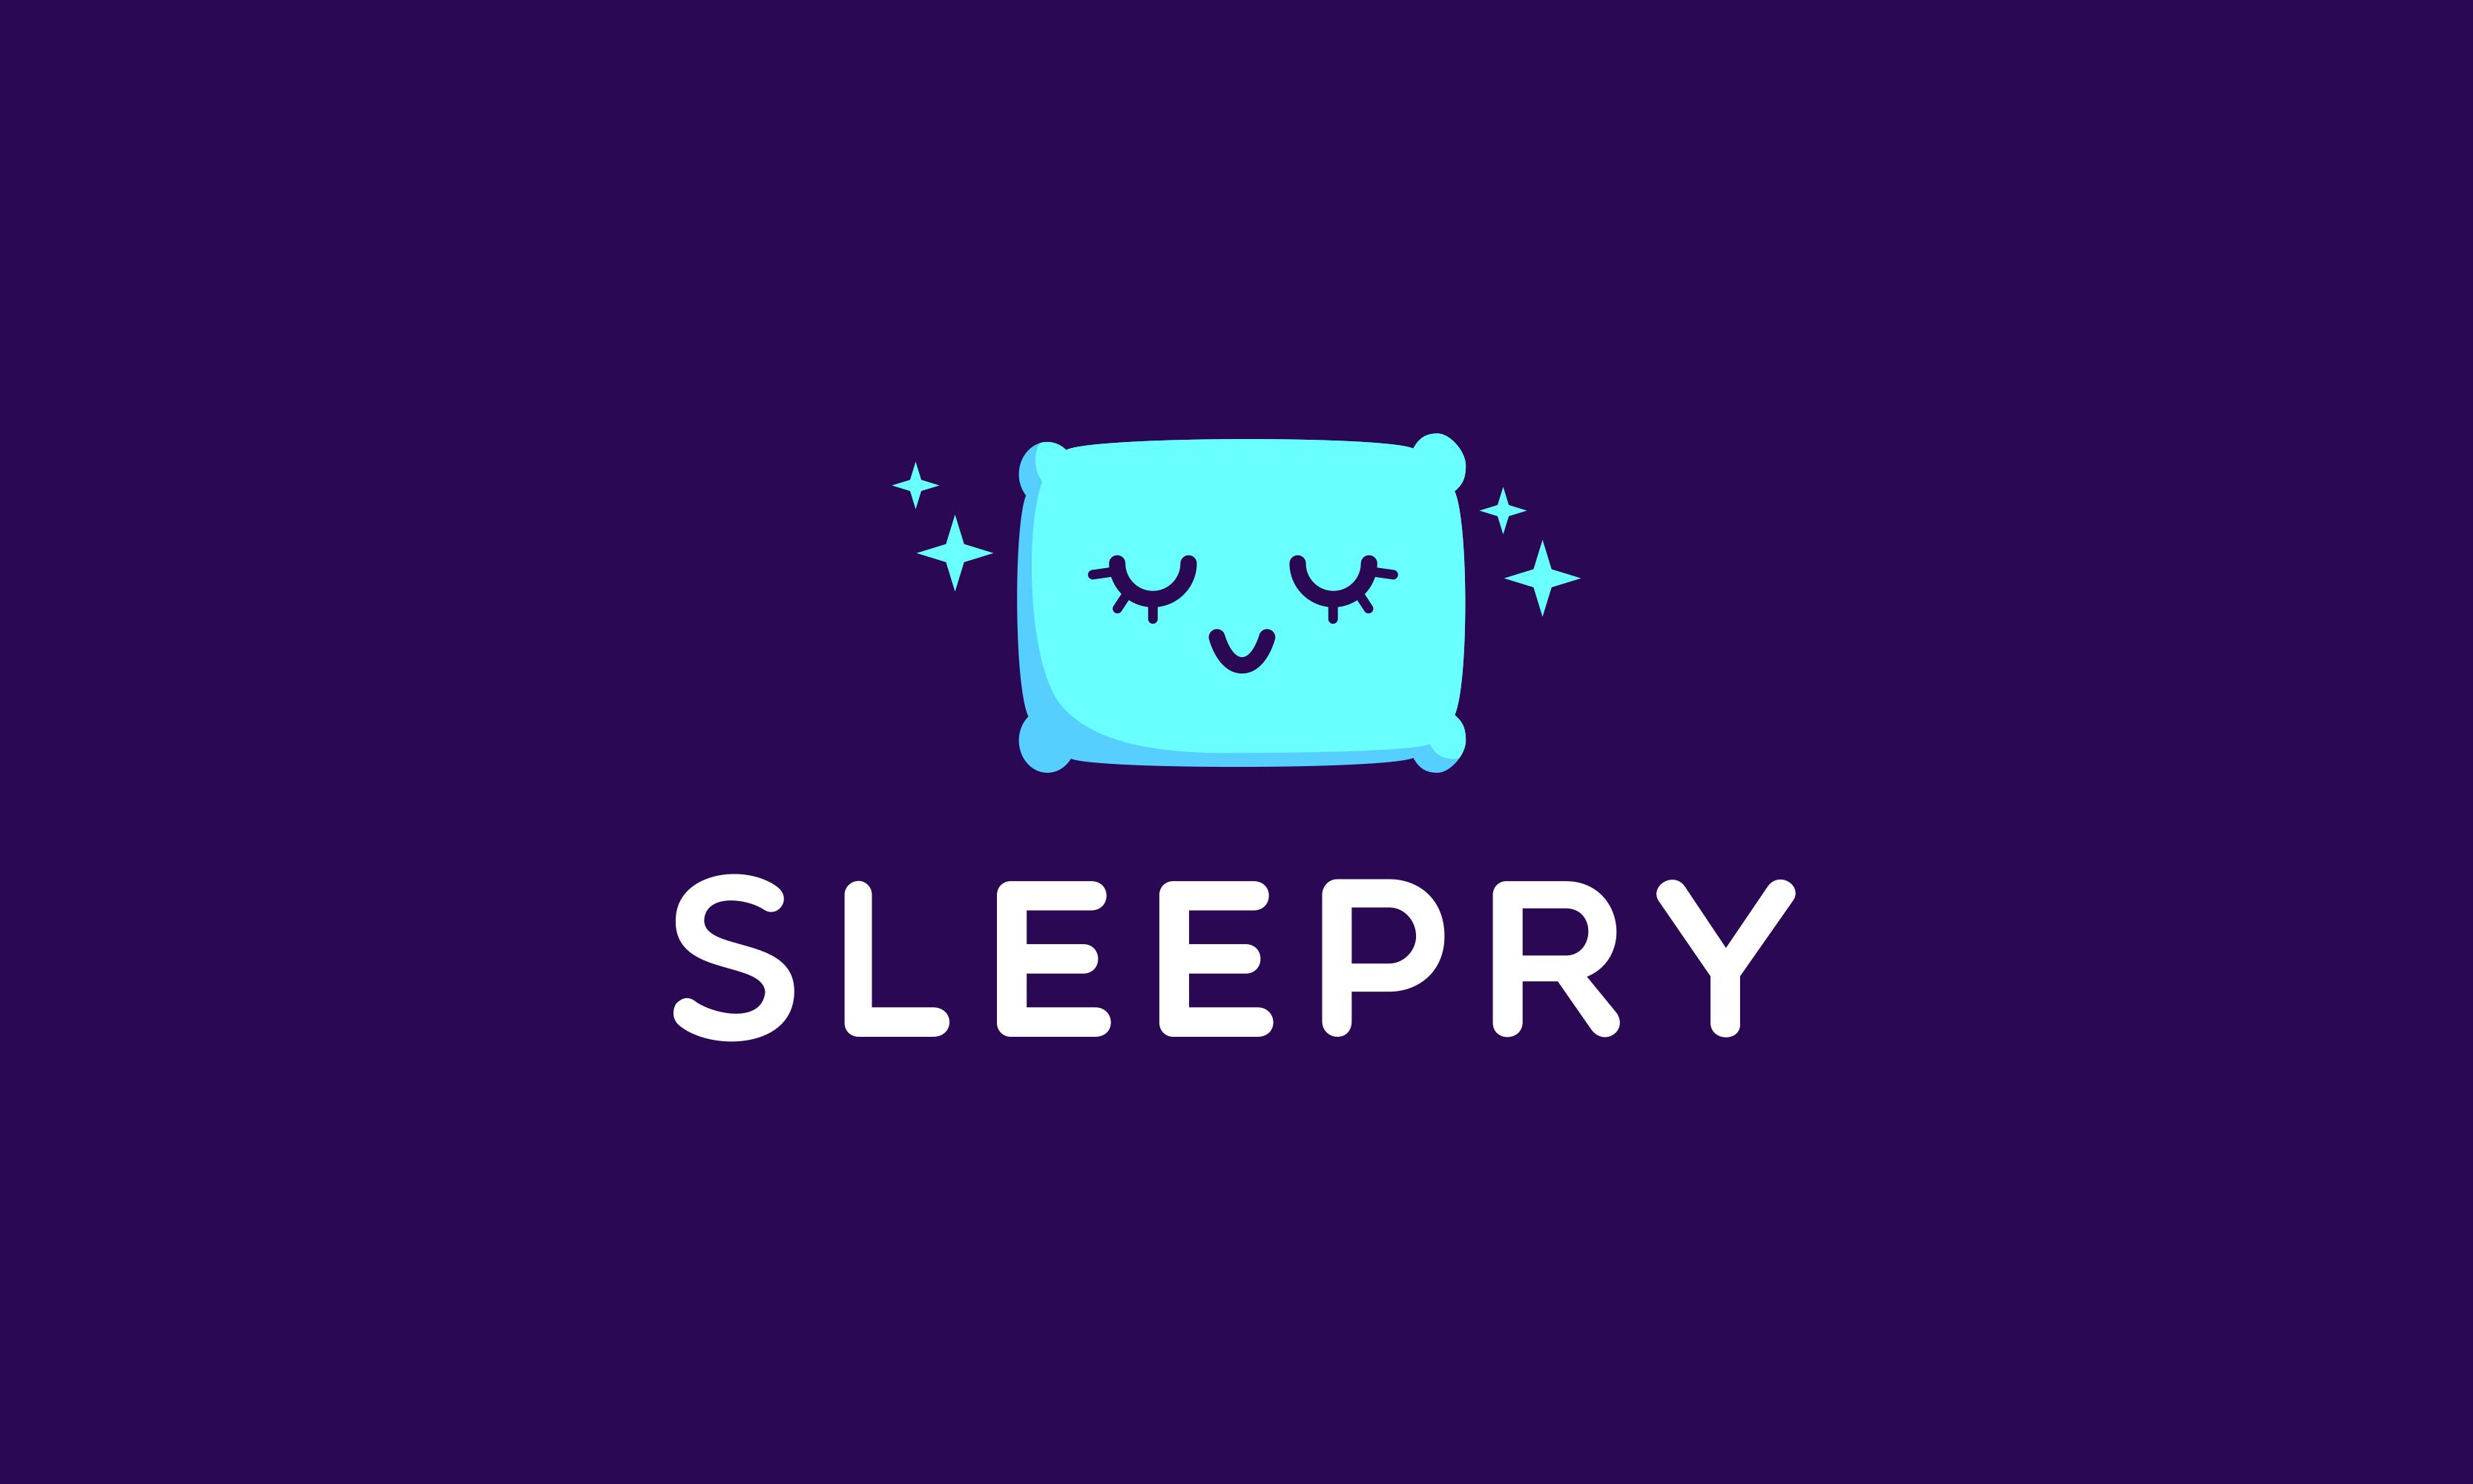 Sleepry